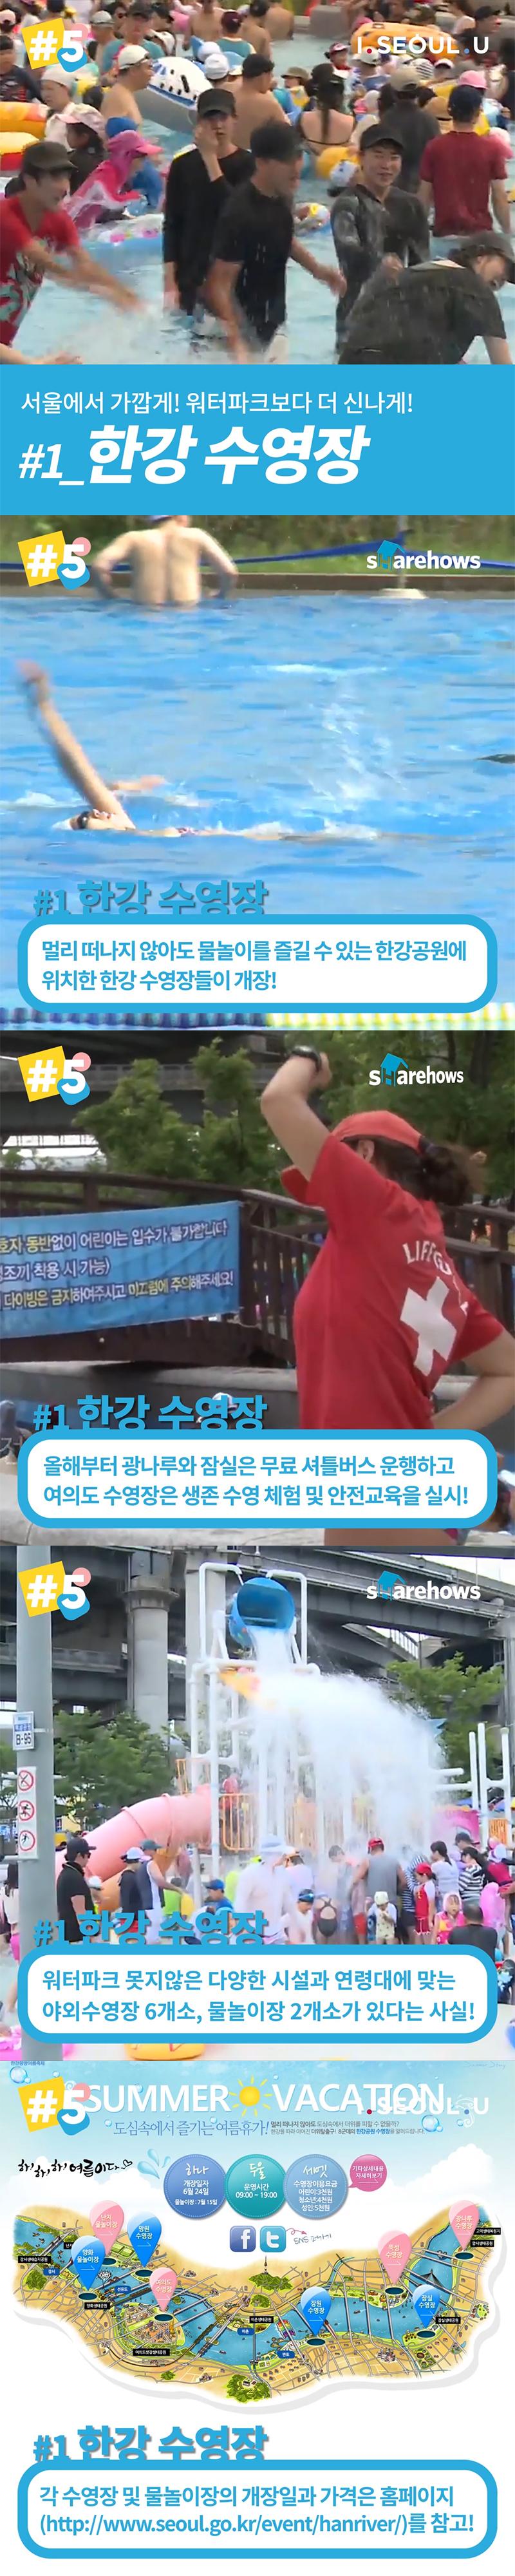 seoul-vacation-5 01